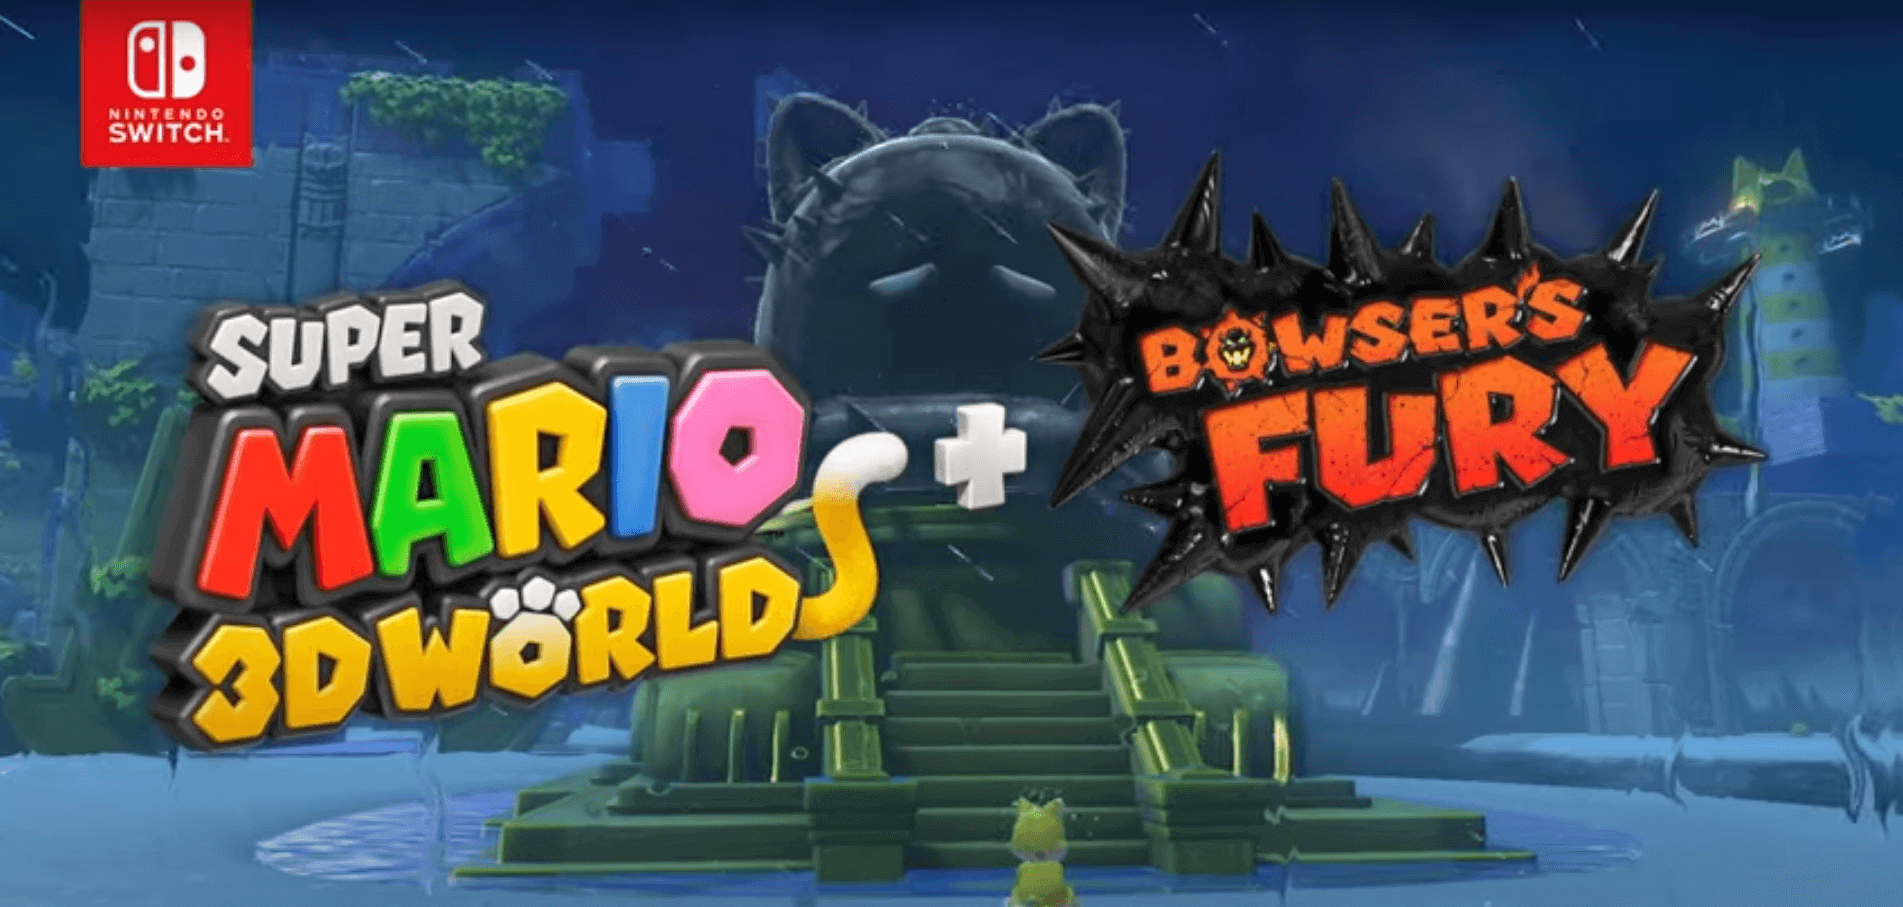 super mario 3d world bowsers fury nintendo switch